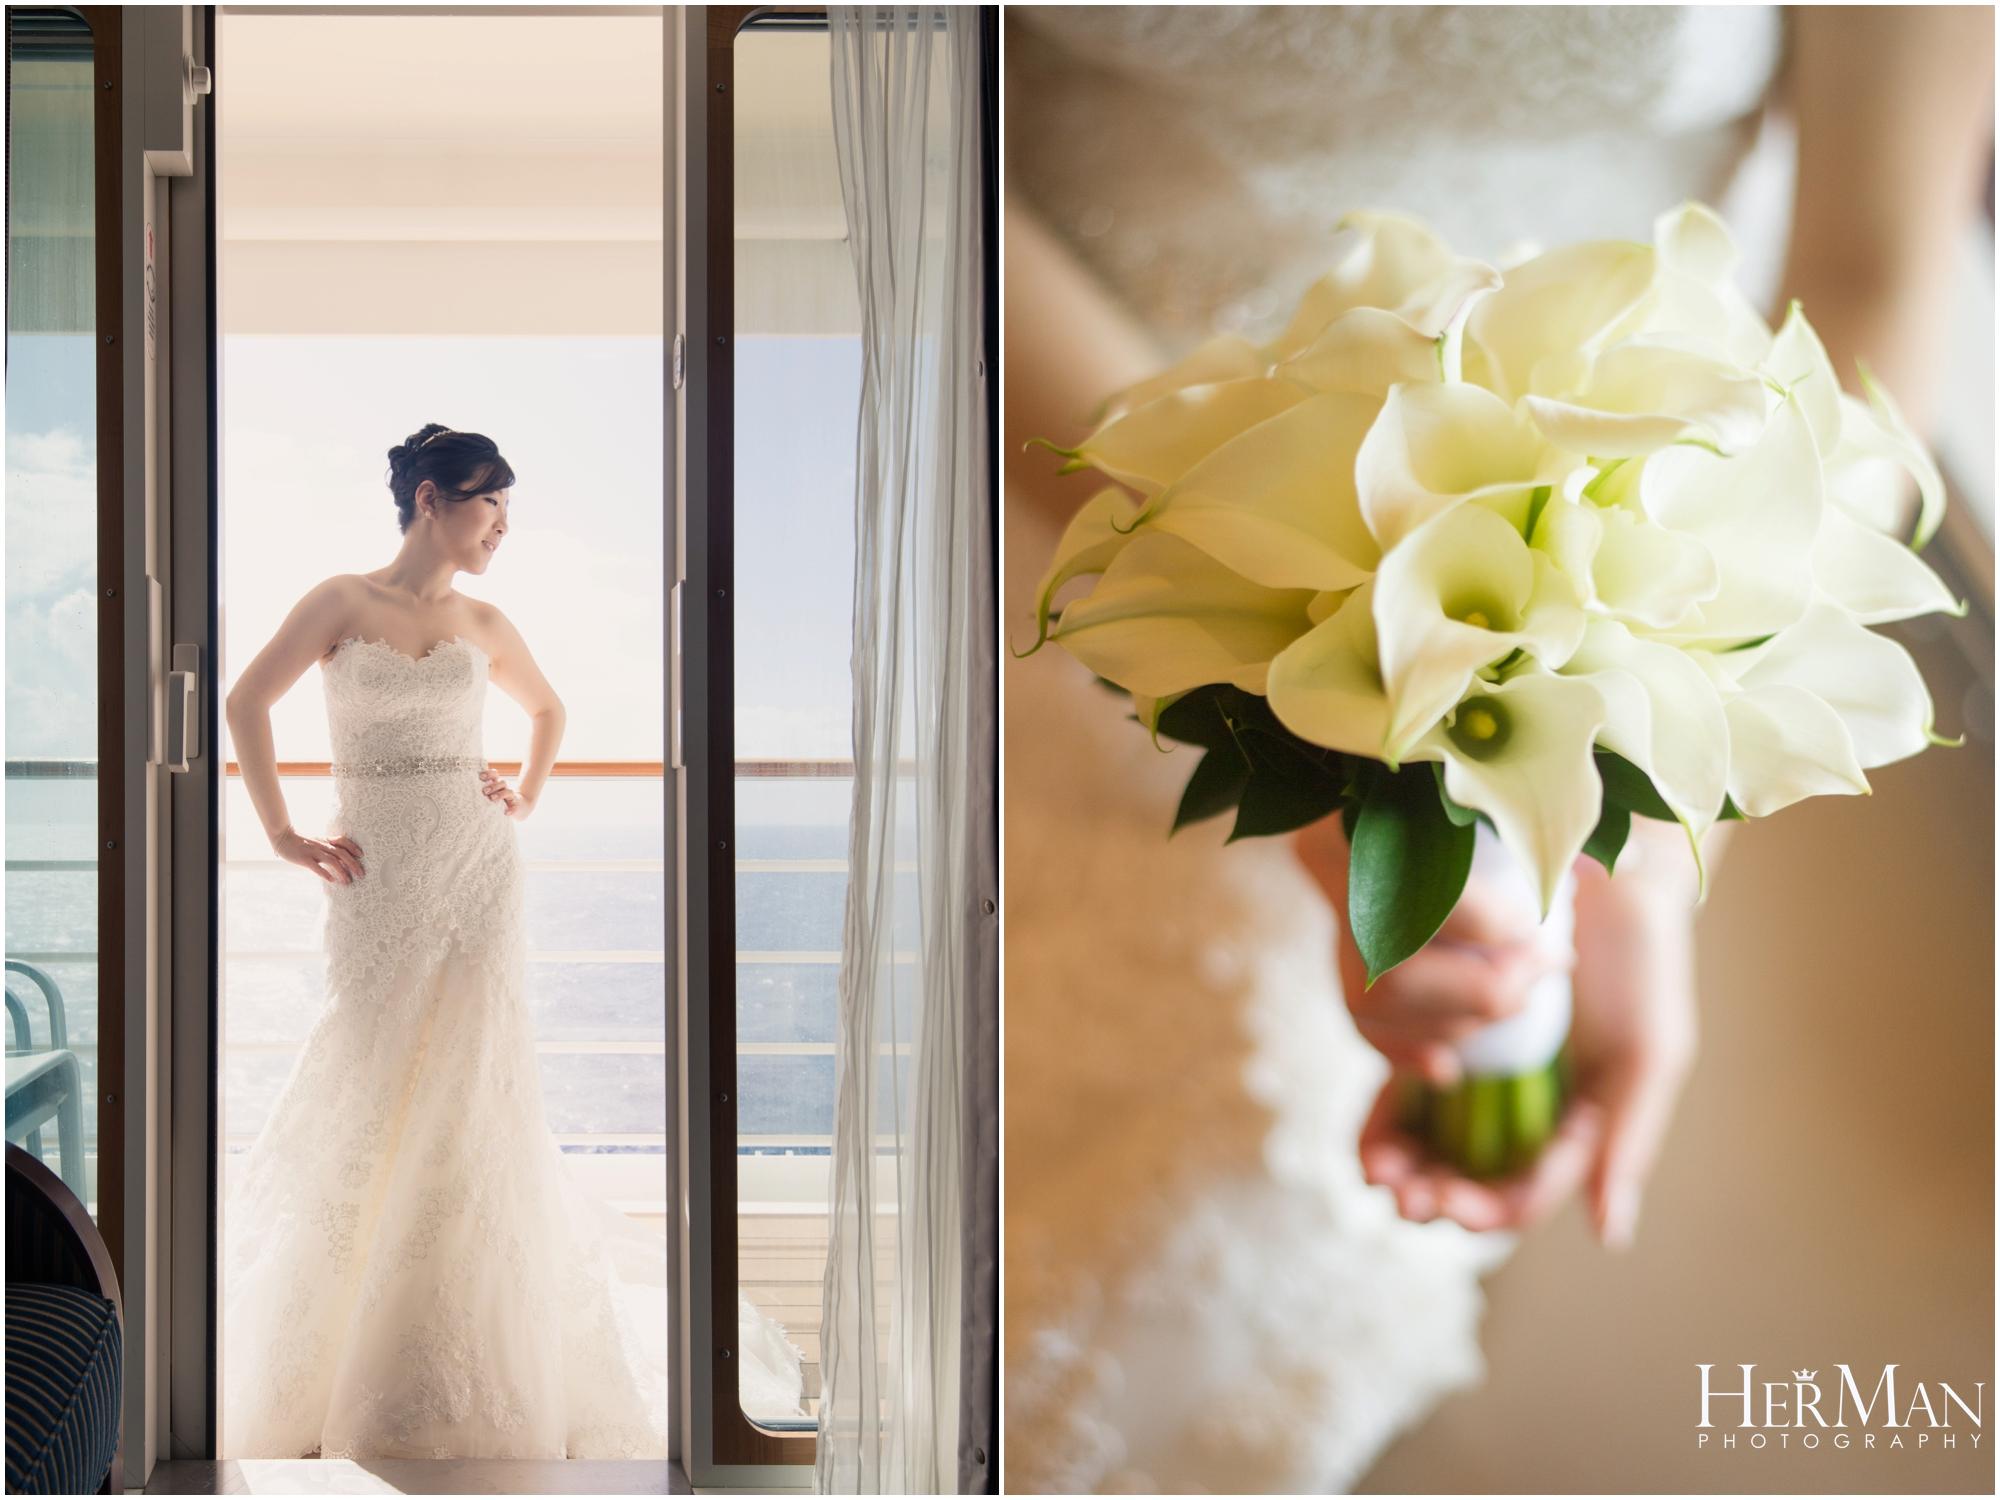 disney-fantasy-cruise-wedding-HerMan-photography_0021.jpg